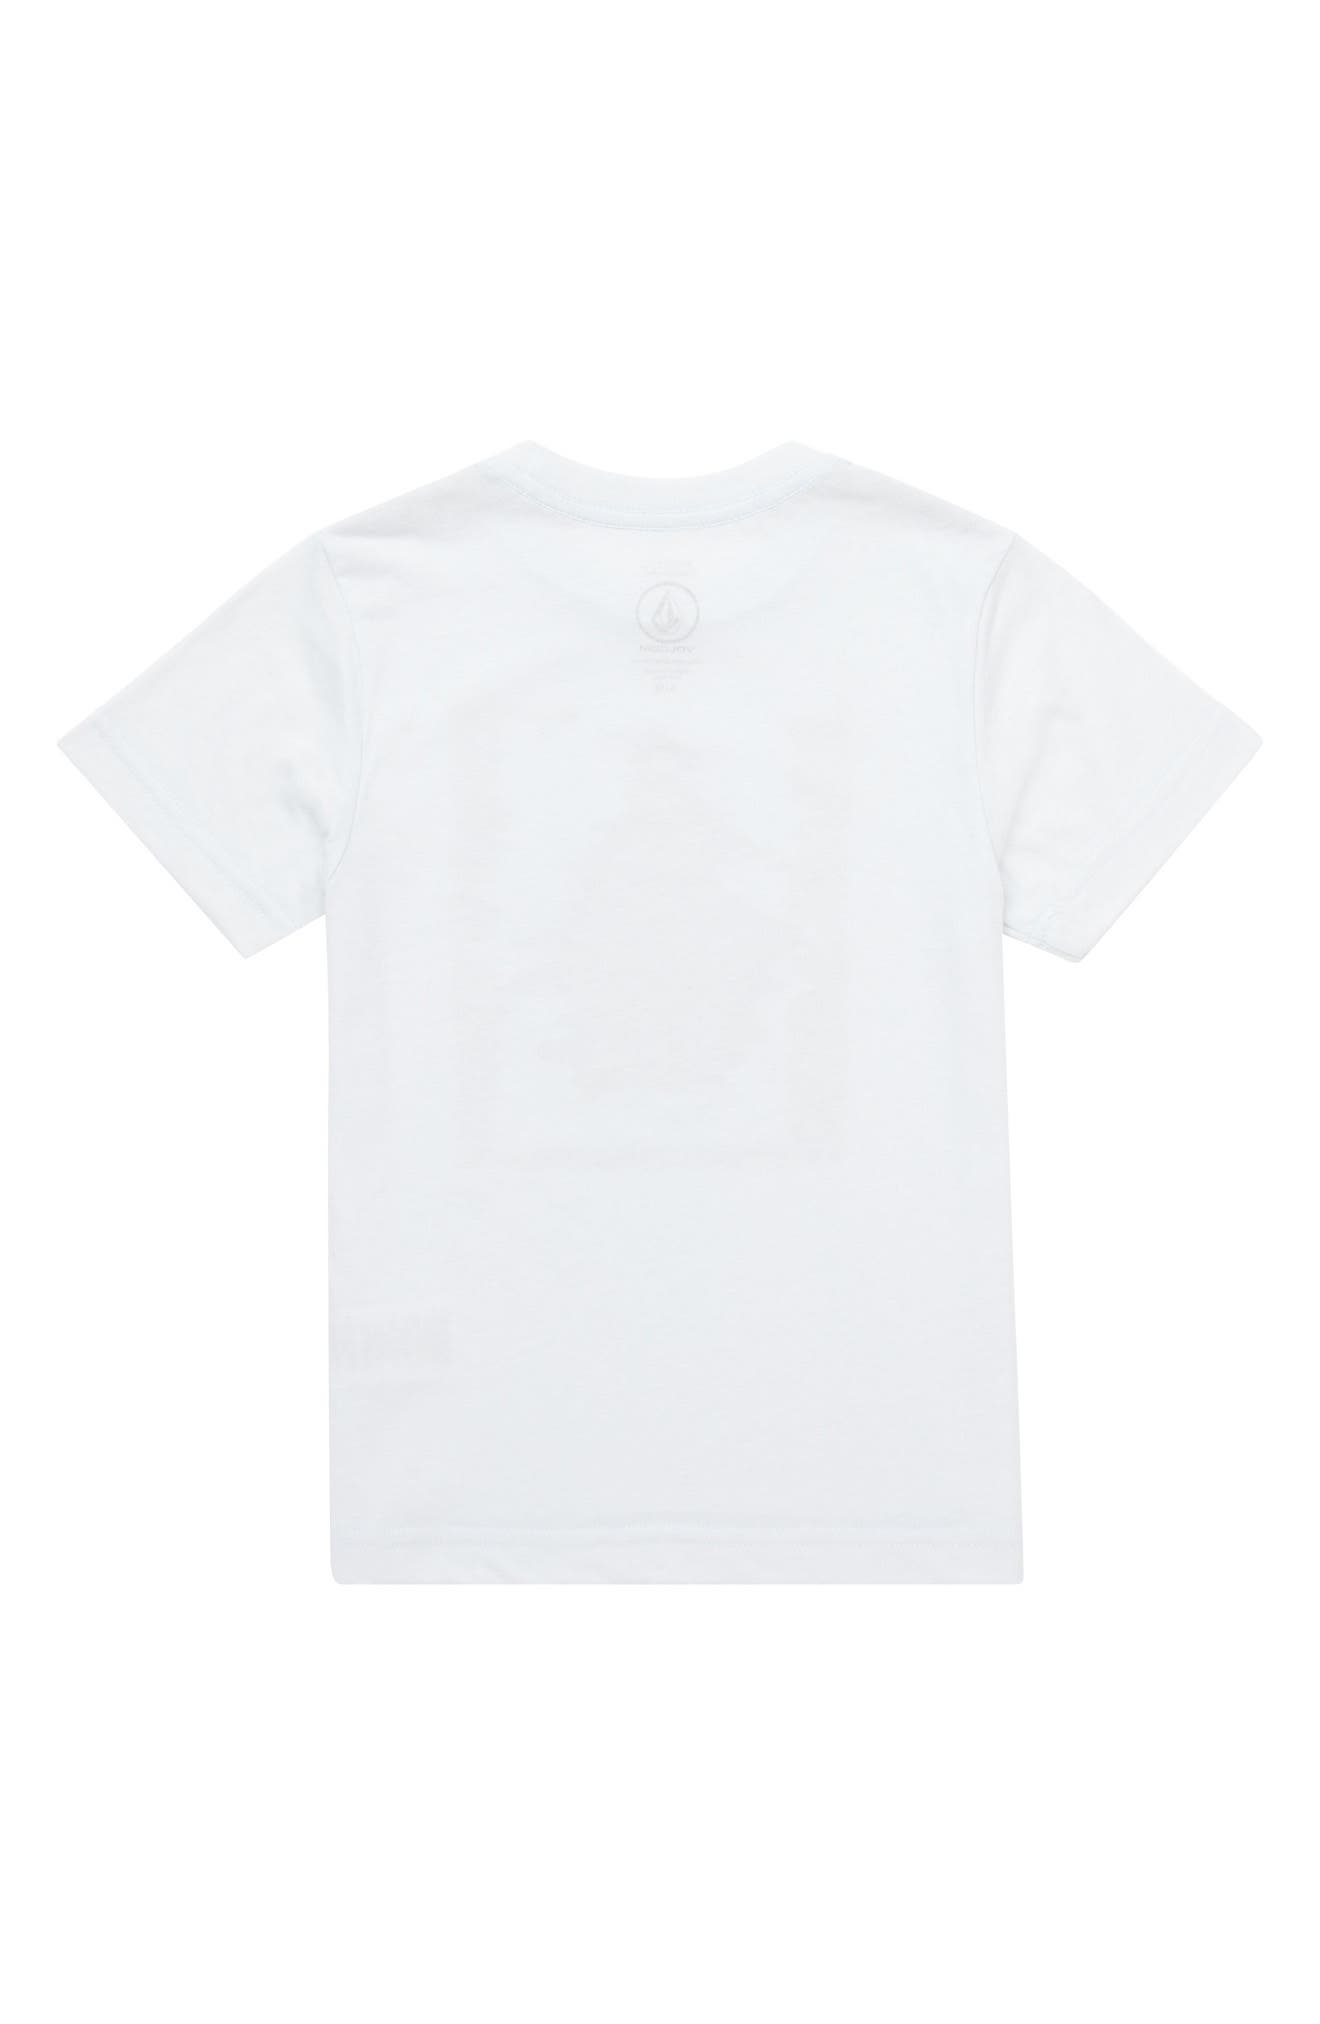 Peace Graphic T-Shirt,                             Alternate thumbnail 2, color,                             101